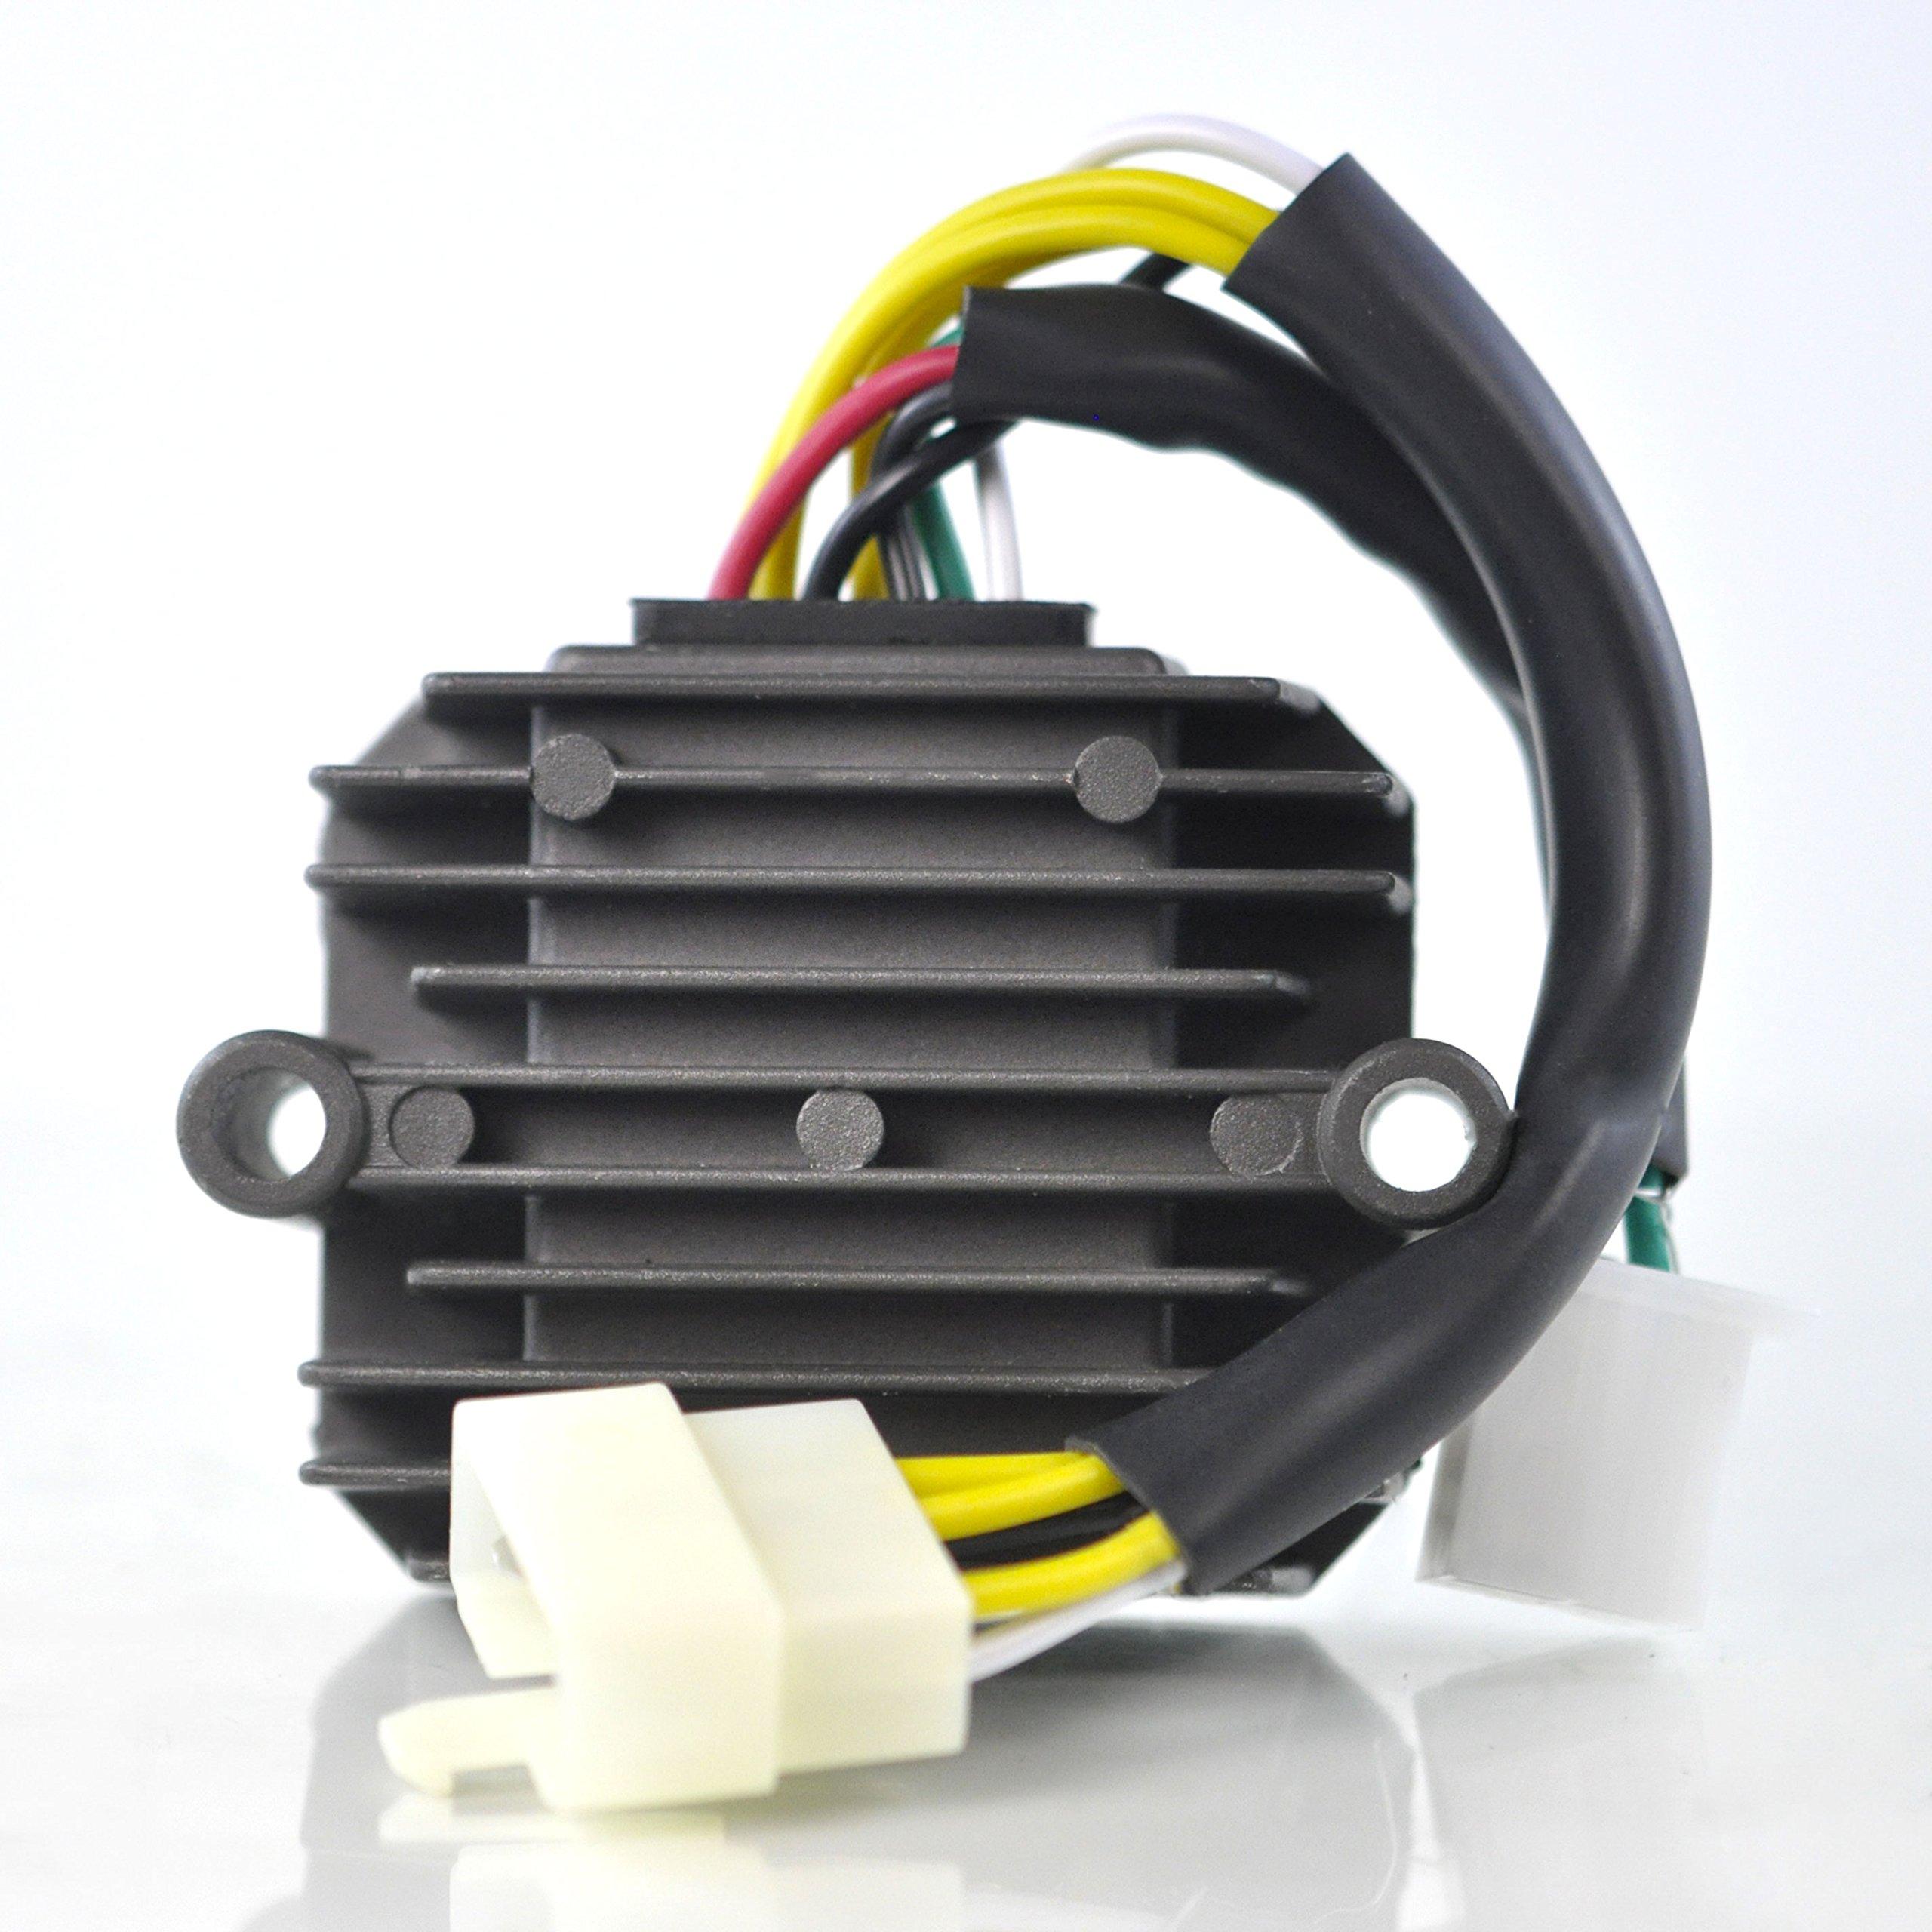 Voltage Regulator For Honda CB650 CB750 Nighthawk/CB750C CB900C Custom/CB750K/CB750L Limited/CB750F CB900F CBX Super Sport/CB1000/CB1100 1979-1985 Repl.# 31600-425-008 31600-MG5-000